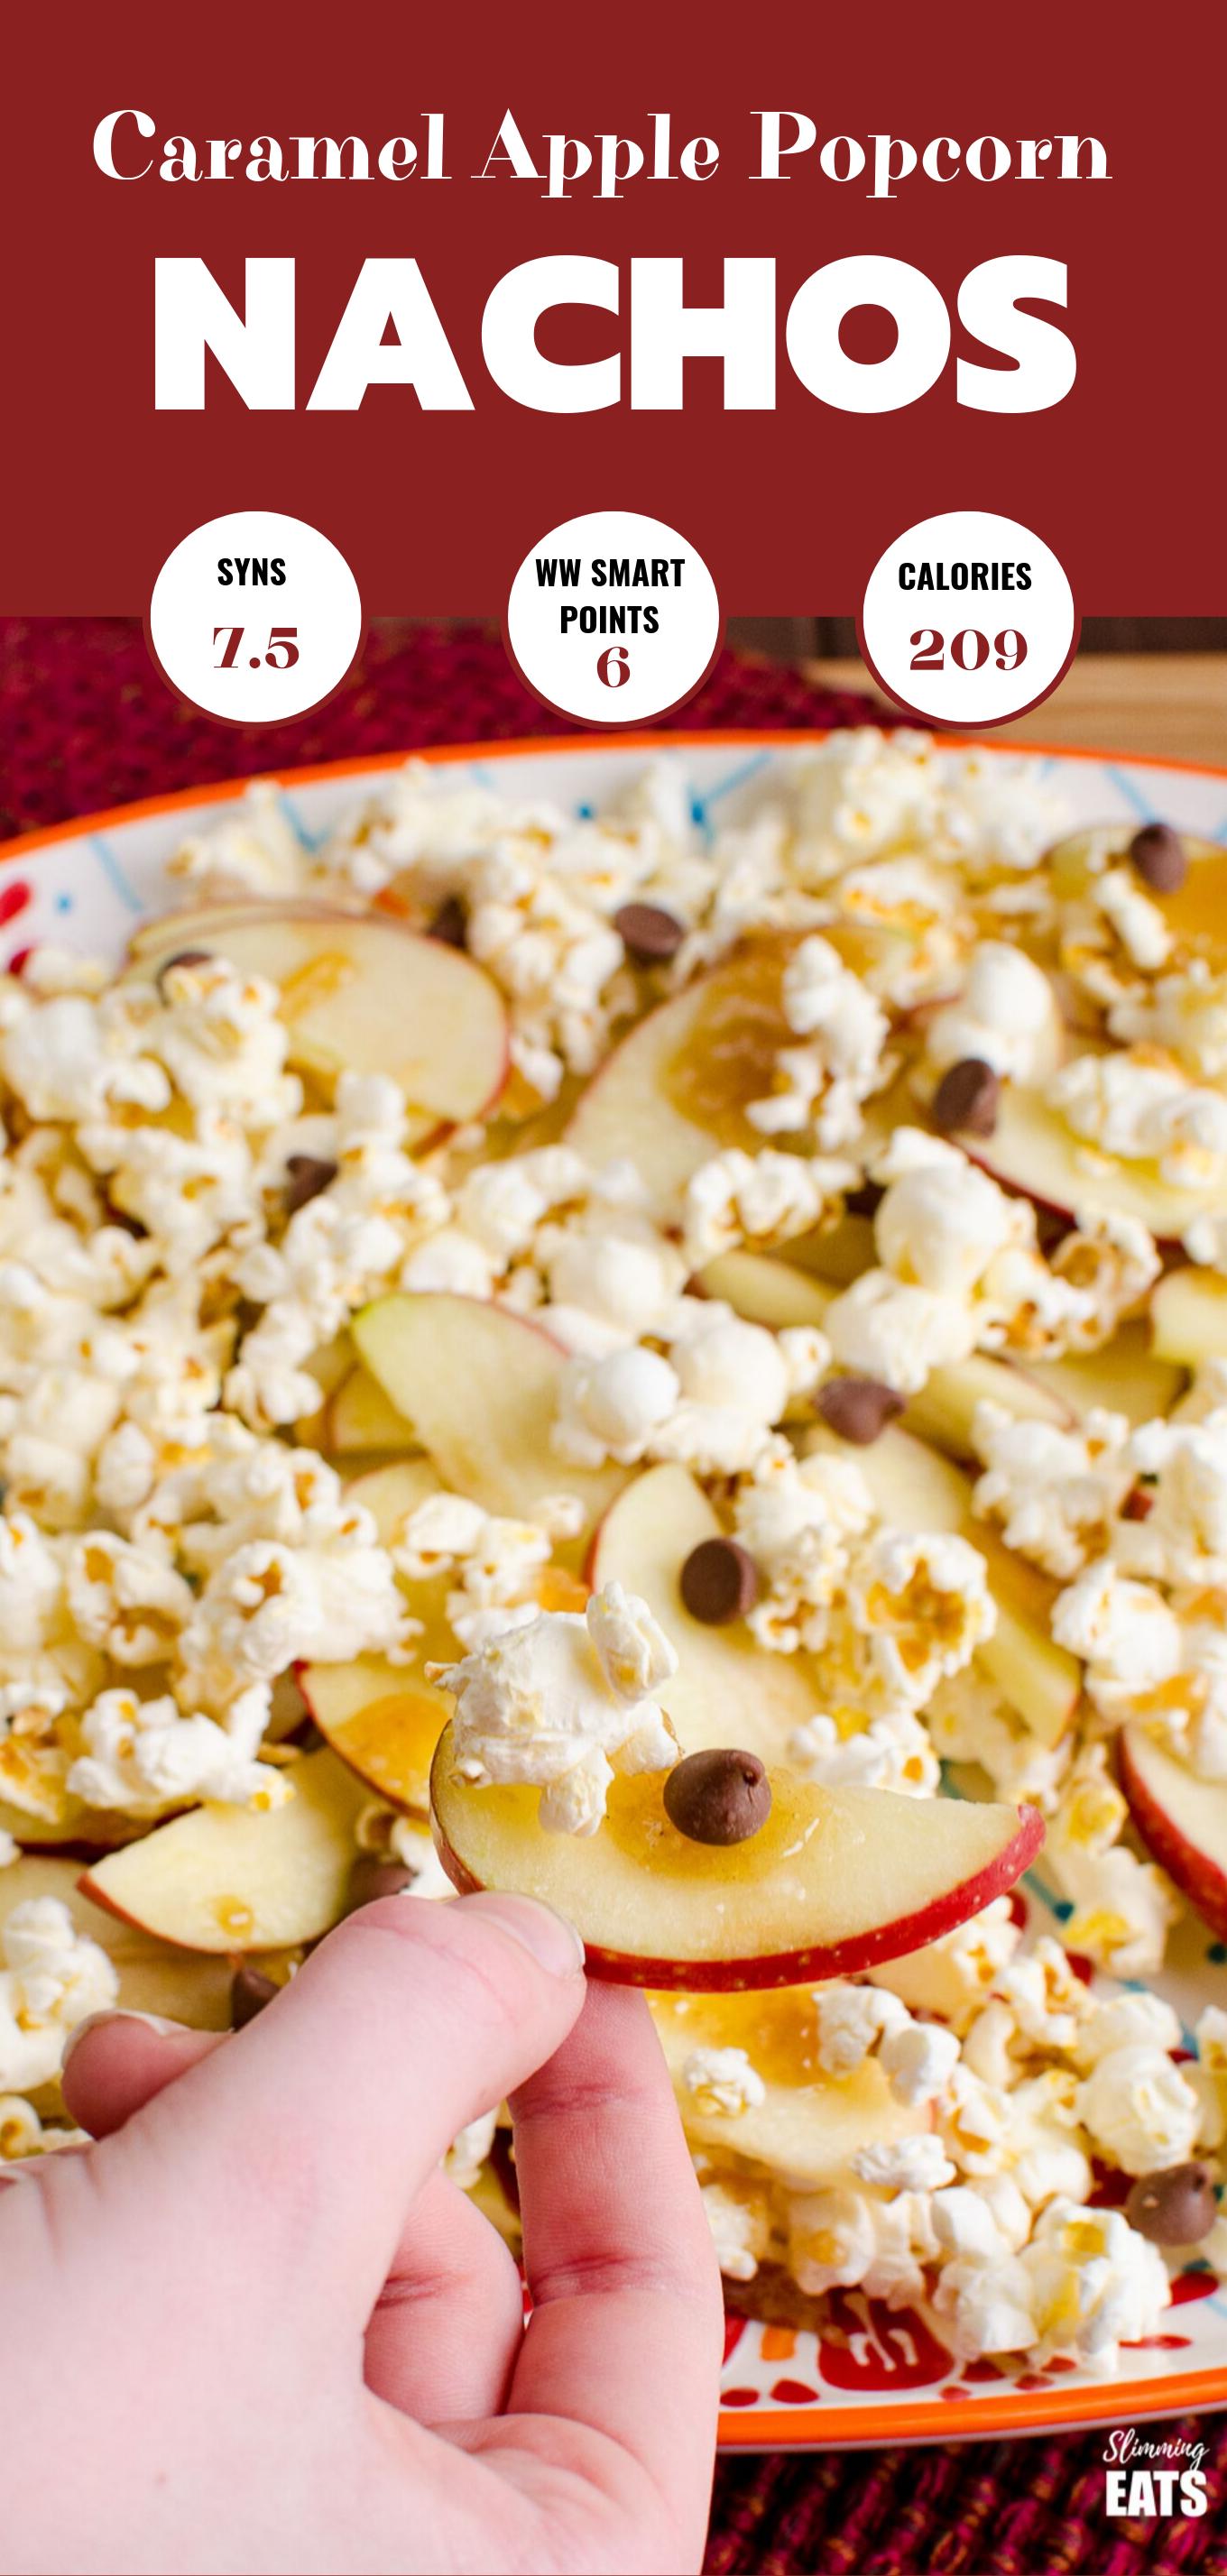 caramel apple popcorn nachos.